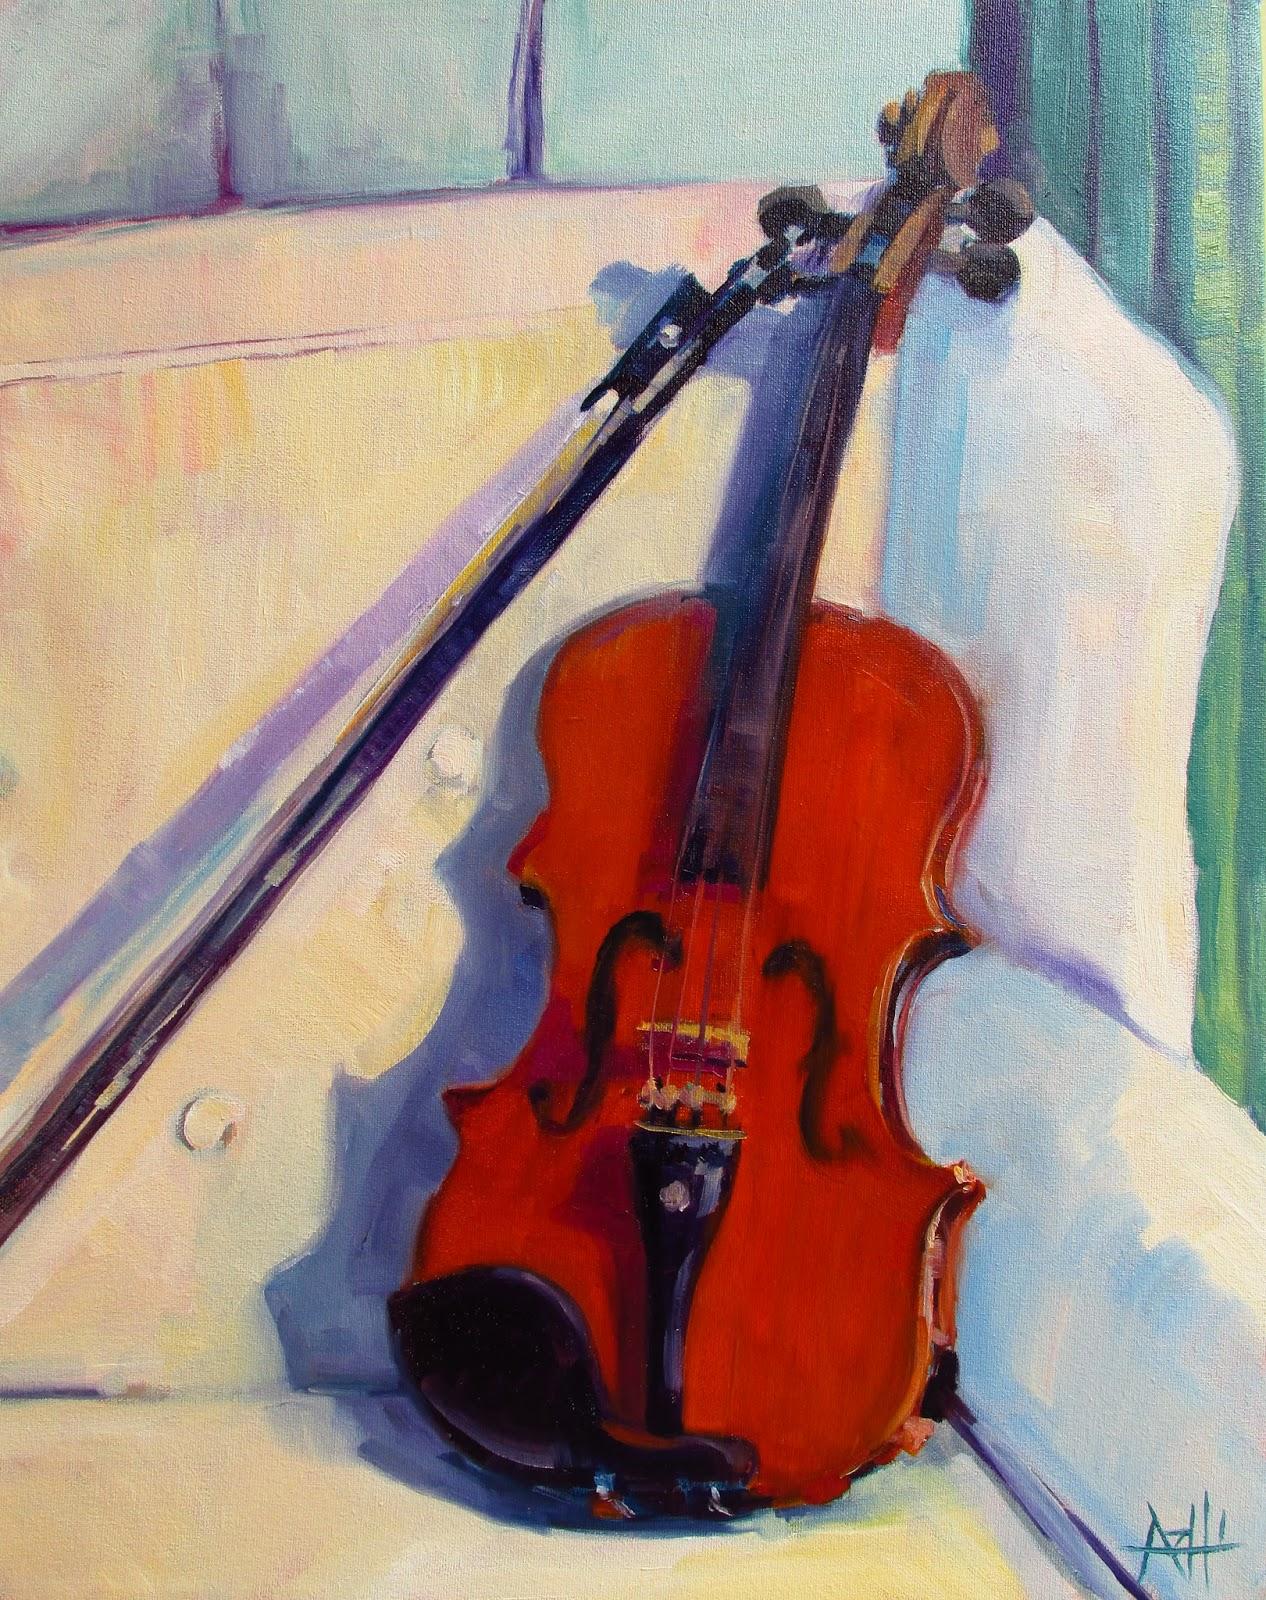 "SOLD, The Violin, Copyright 2016 Hirschten, Oil on Canvas, 16"" x 20"""